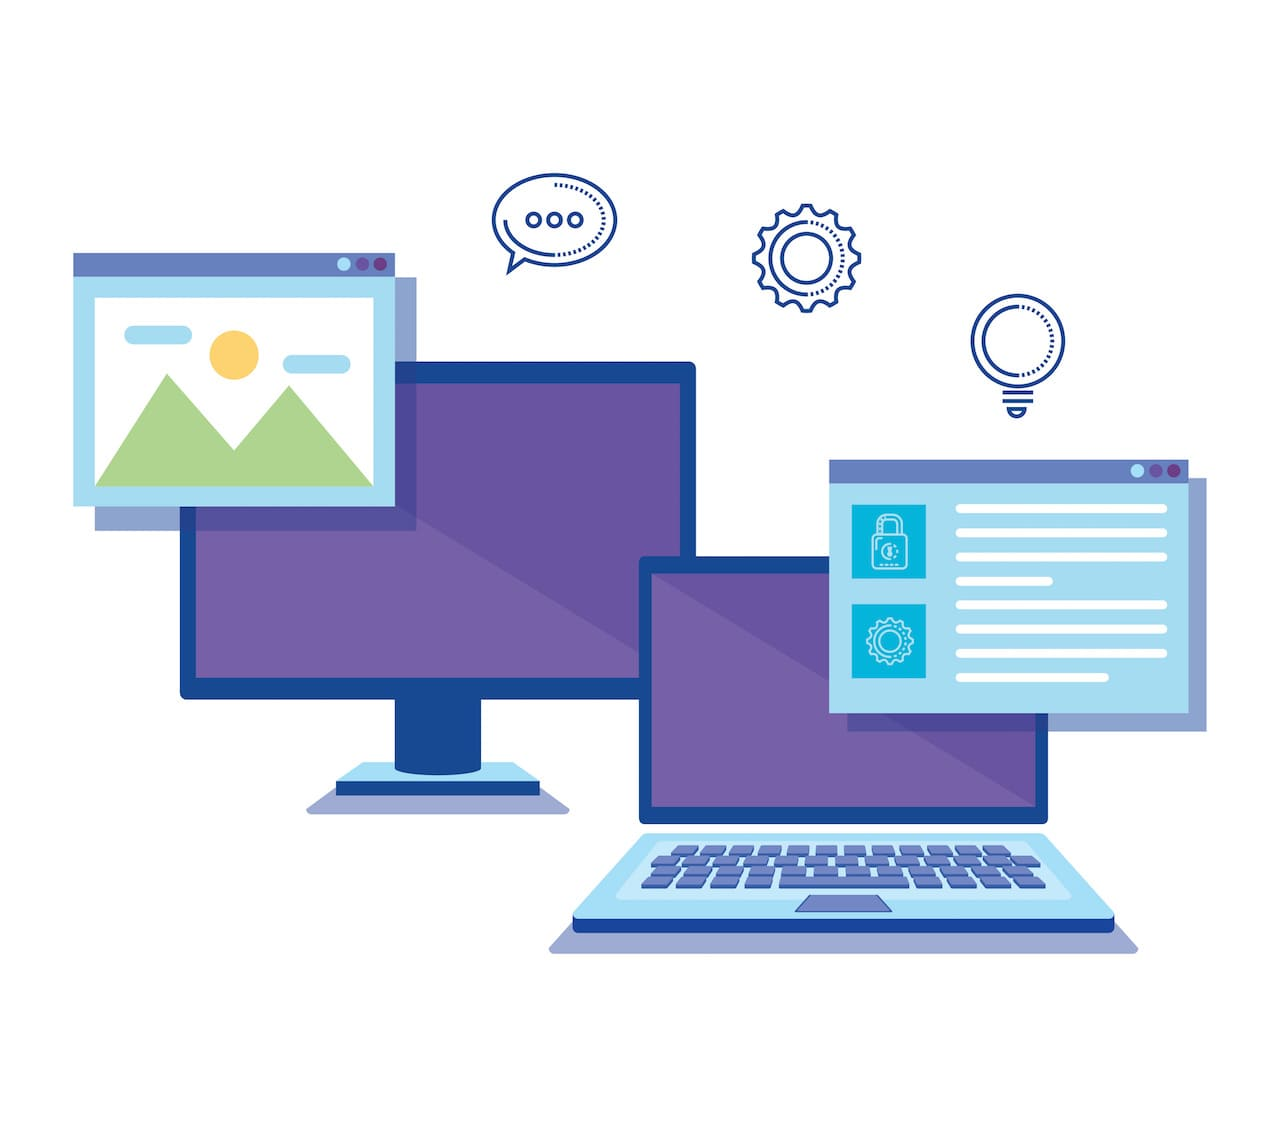 Windows10のバージョン確認方法と最新バージョンにアップデートする方法